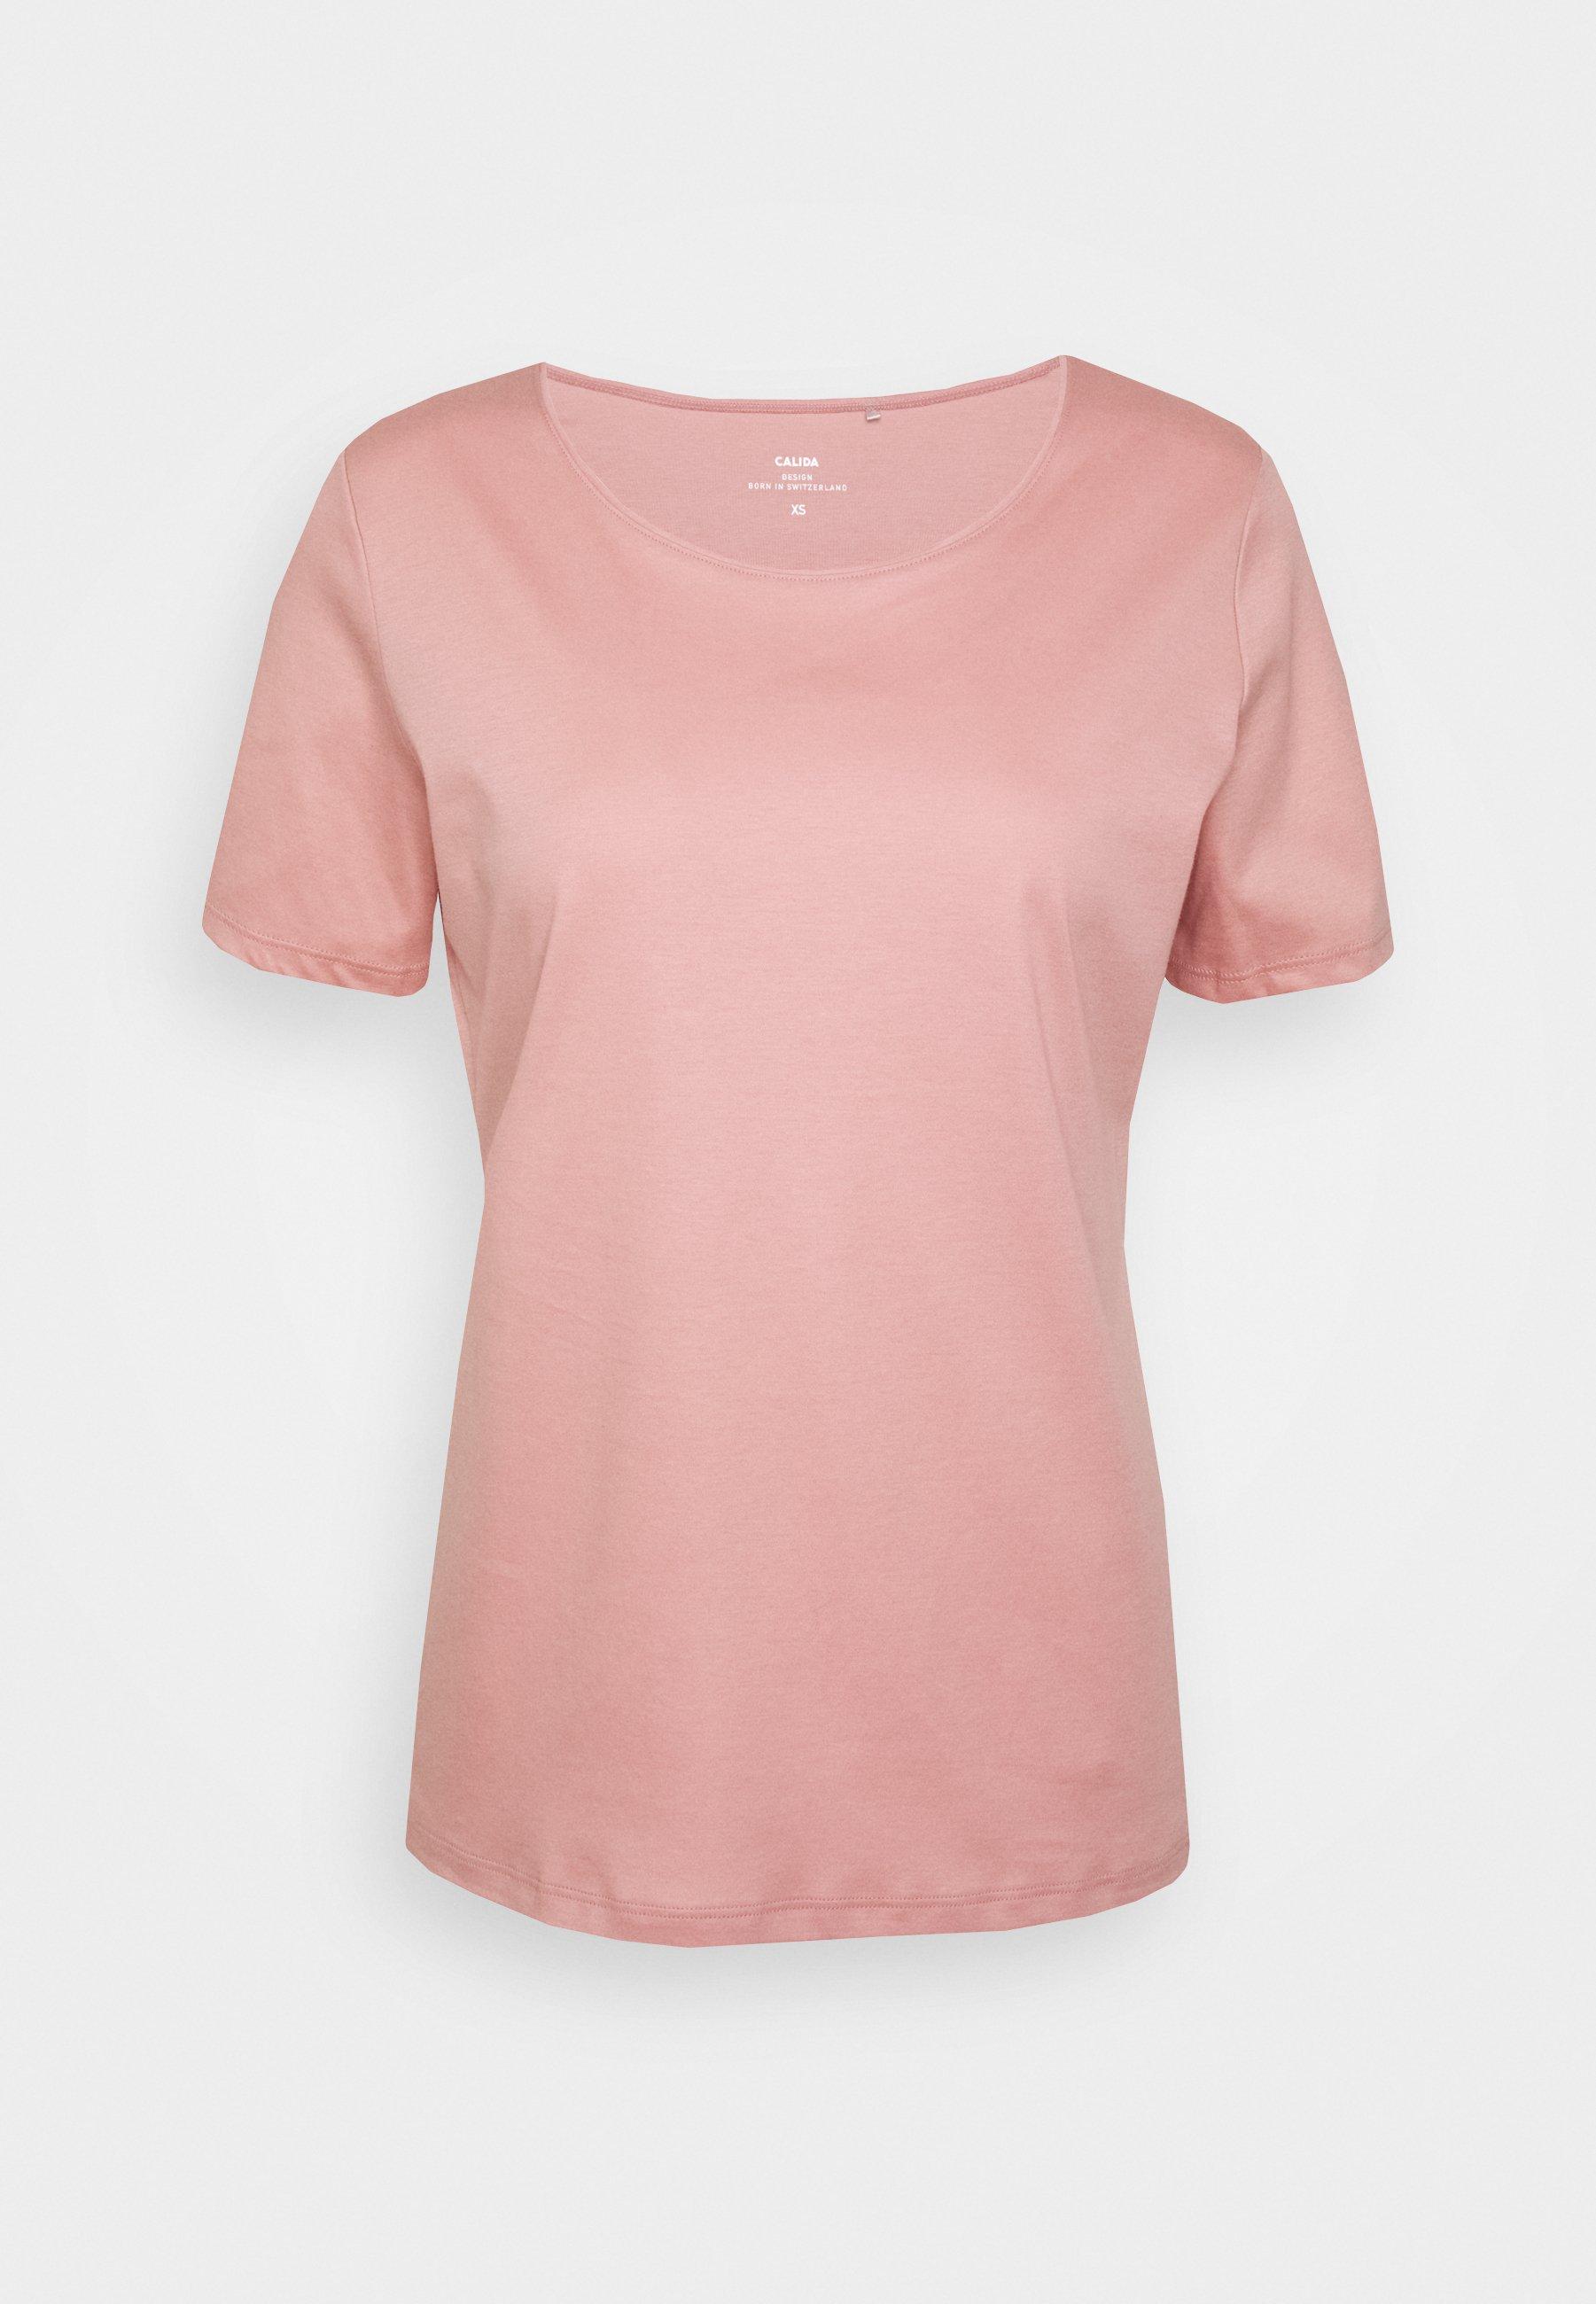 Damen FAVOURITES DREAMS KURZARM - Nachtwäsche Shirt